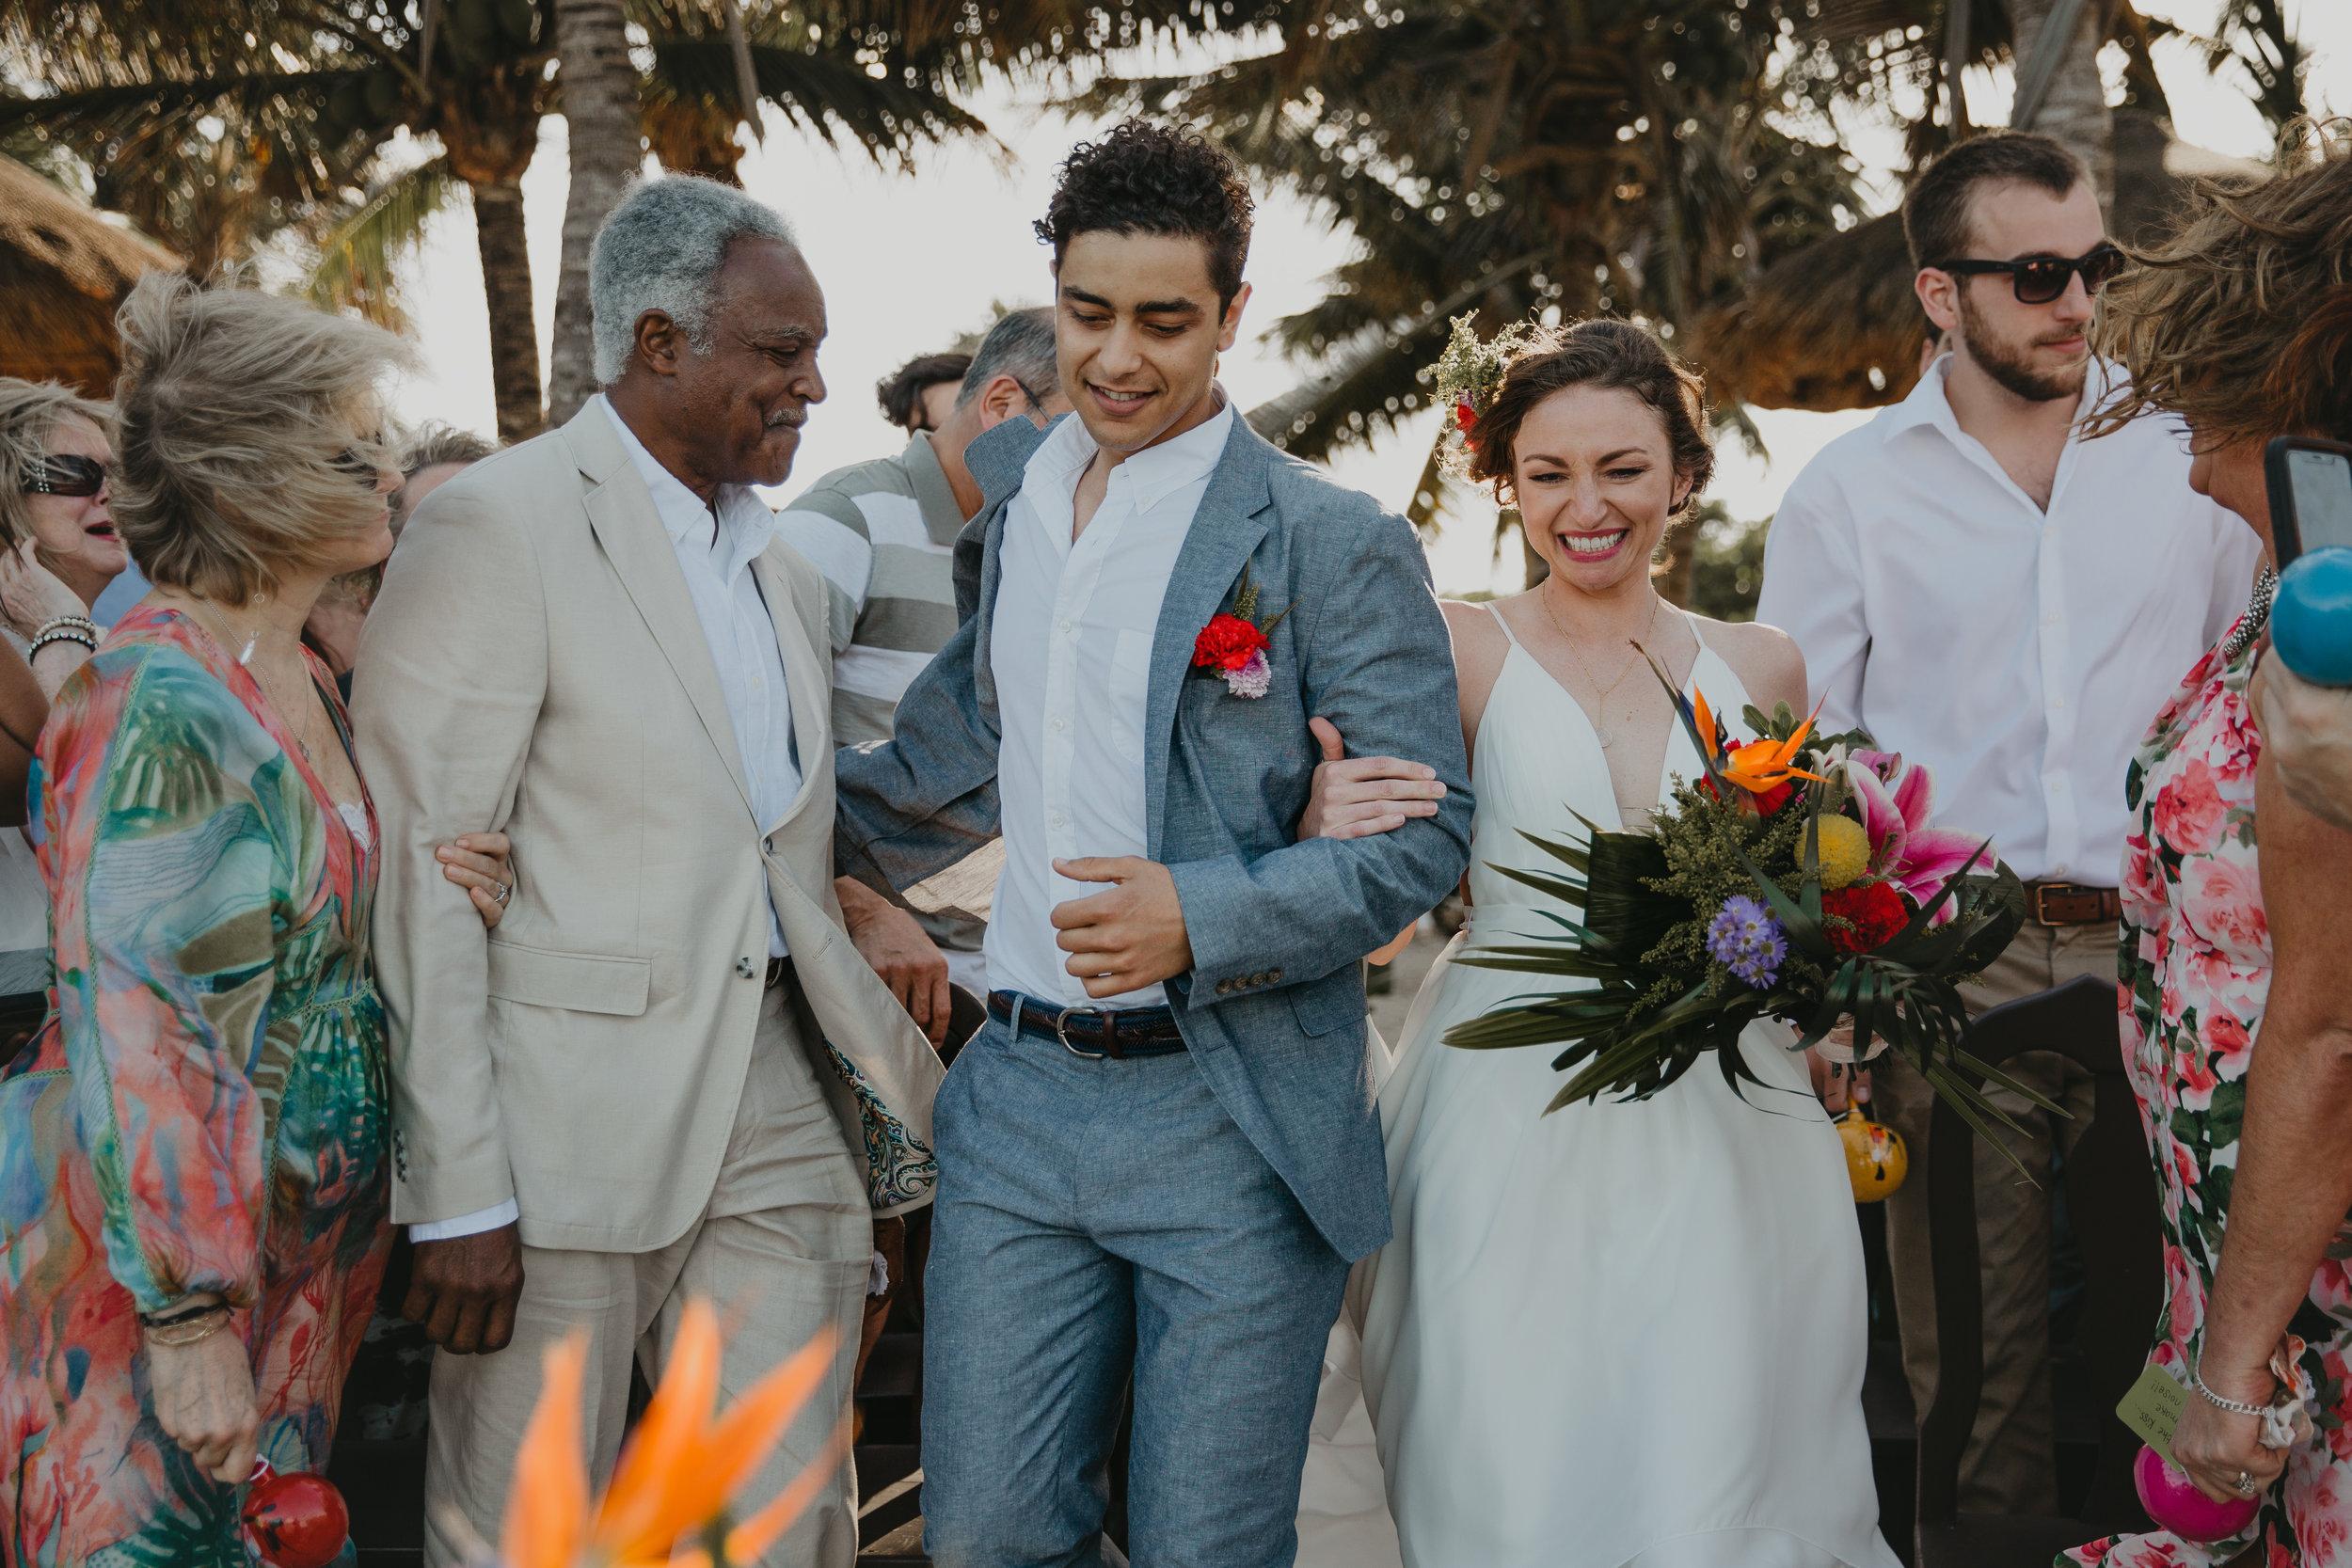 Nicole-Daacke-Photography-beachfront-akumal-destionation-wedding-tulum-mexico-elopement-photographer-destination-wedding-inspiration-sunset-champagne-pop-boho-bride-ocean-tropical-bohemian-tulum-wedding-photos-155.jpg